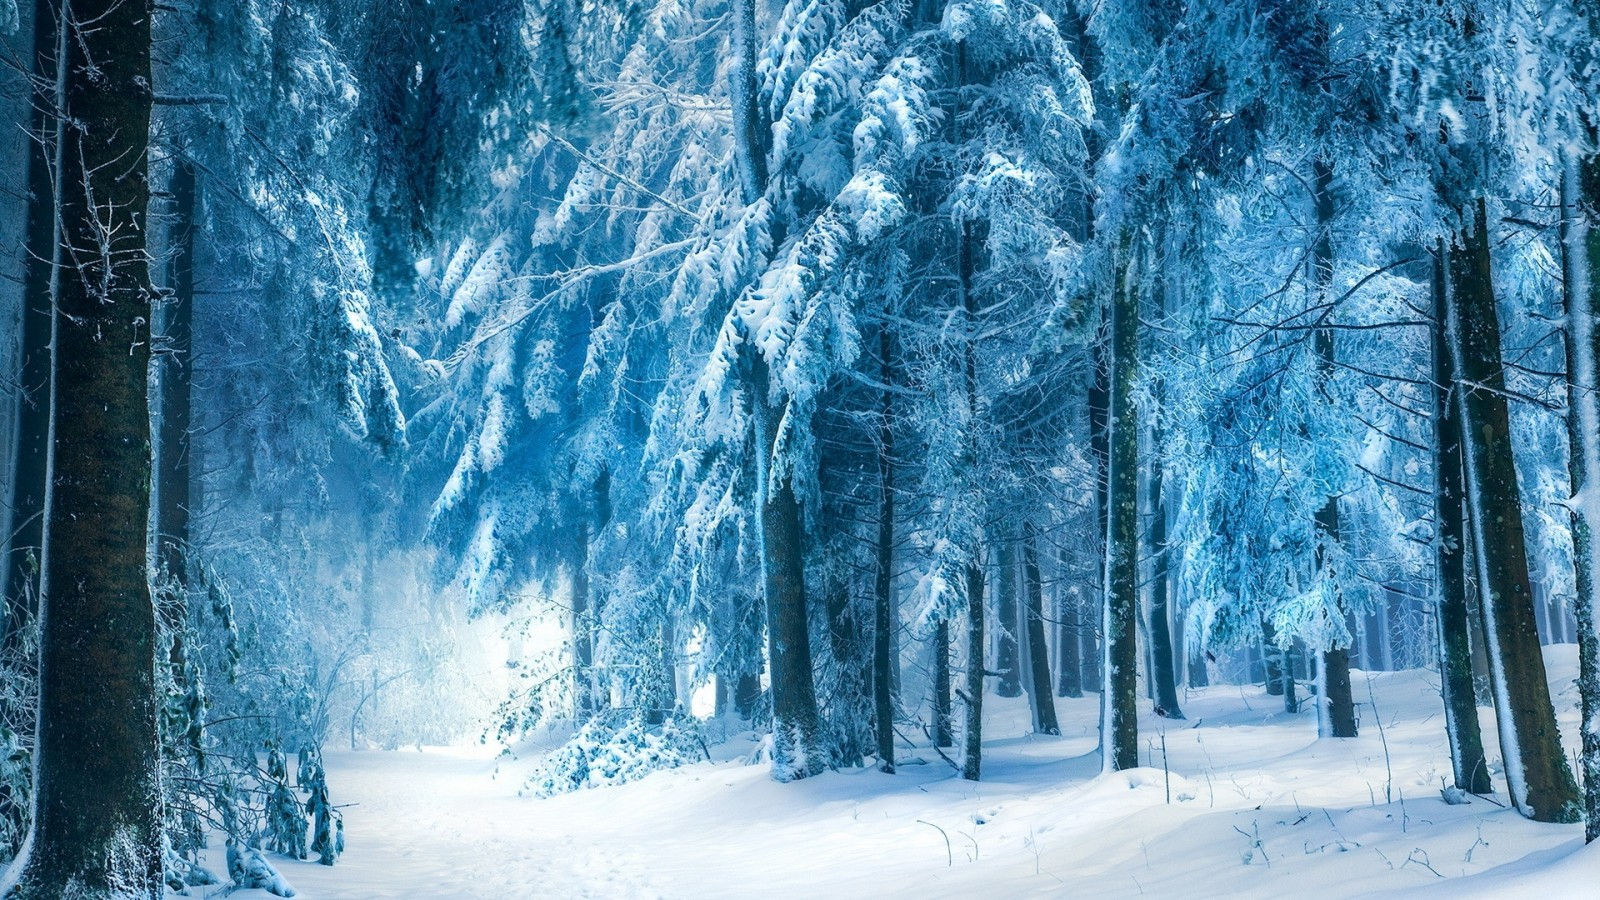 les-zima-sneg-derevya-6619.jpg